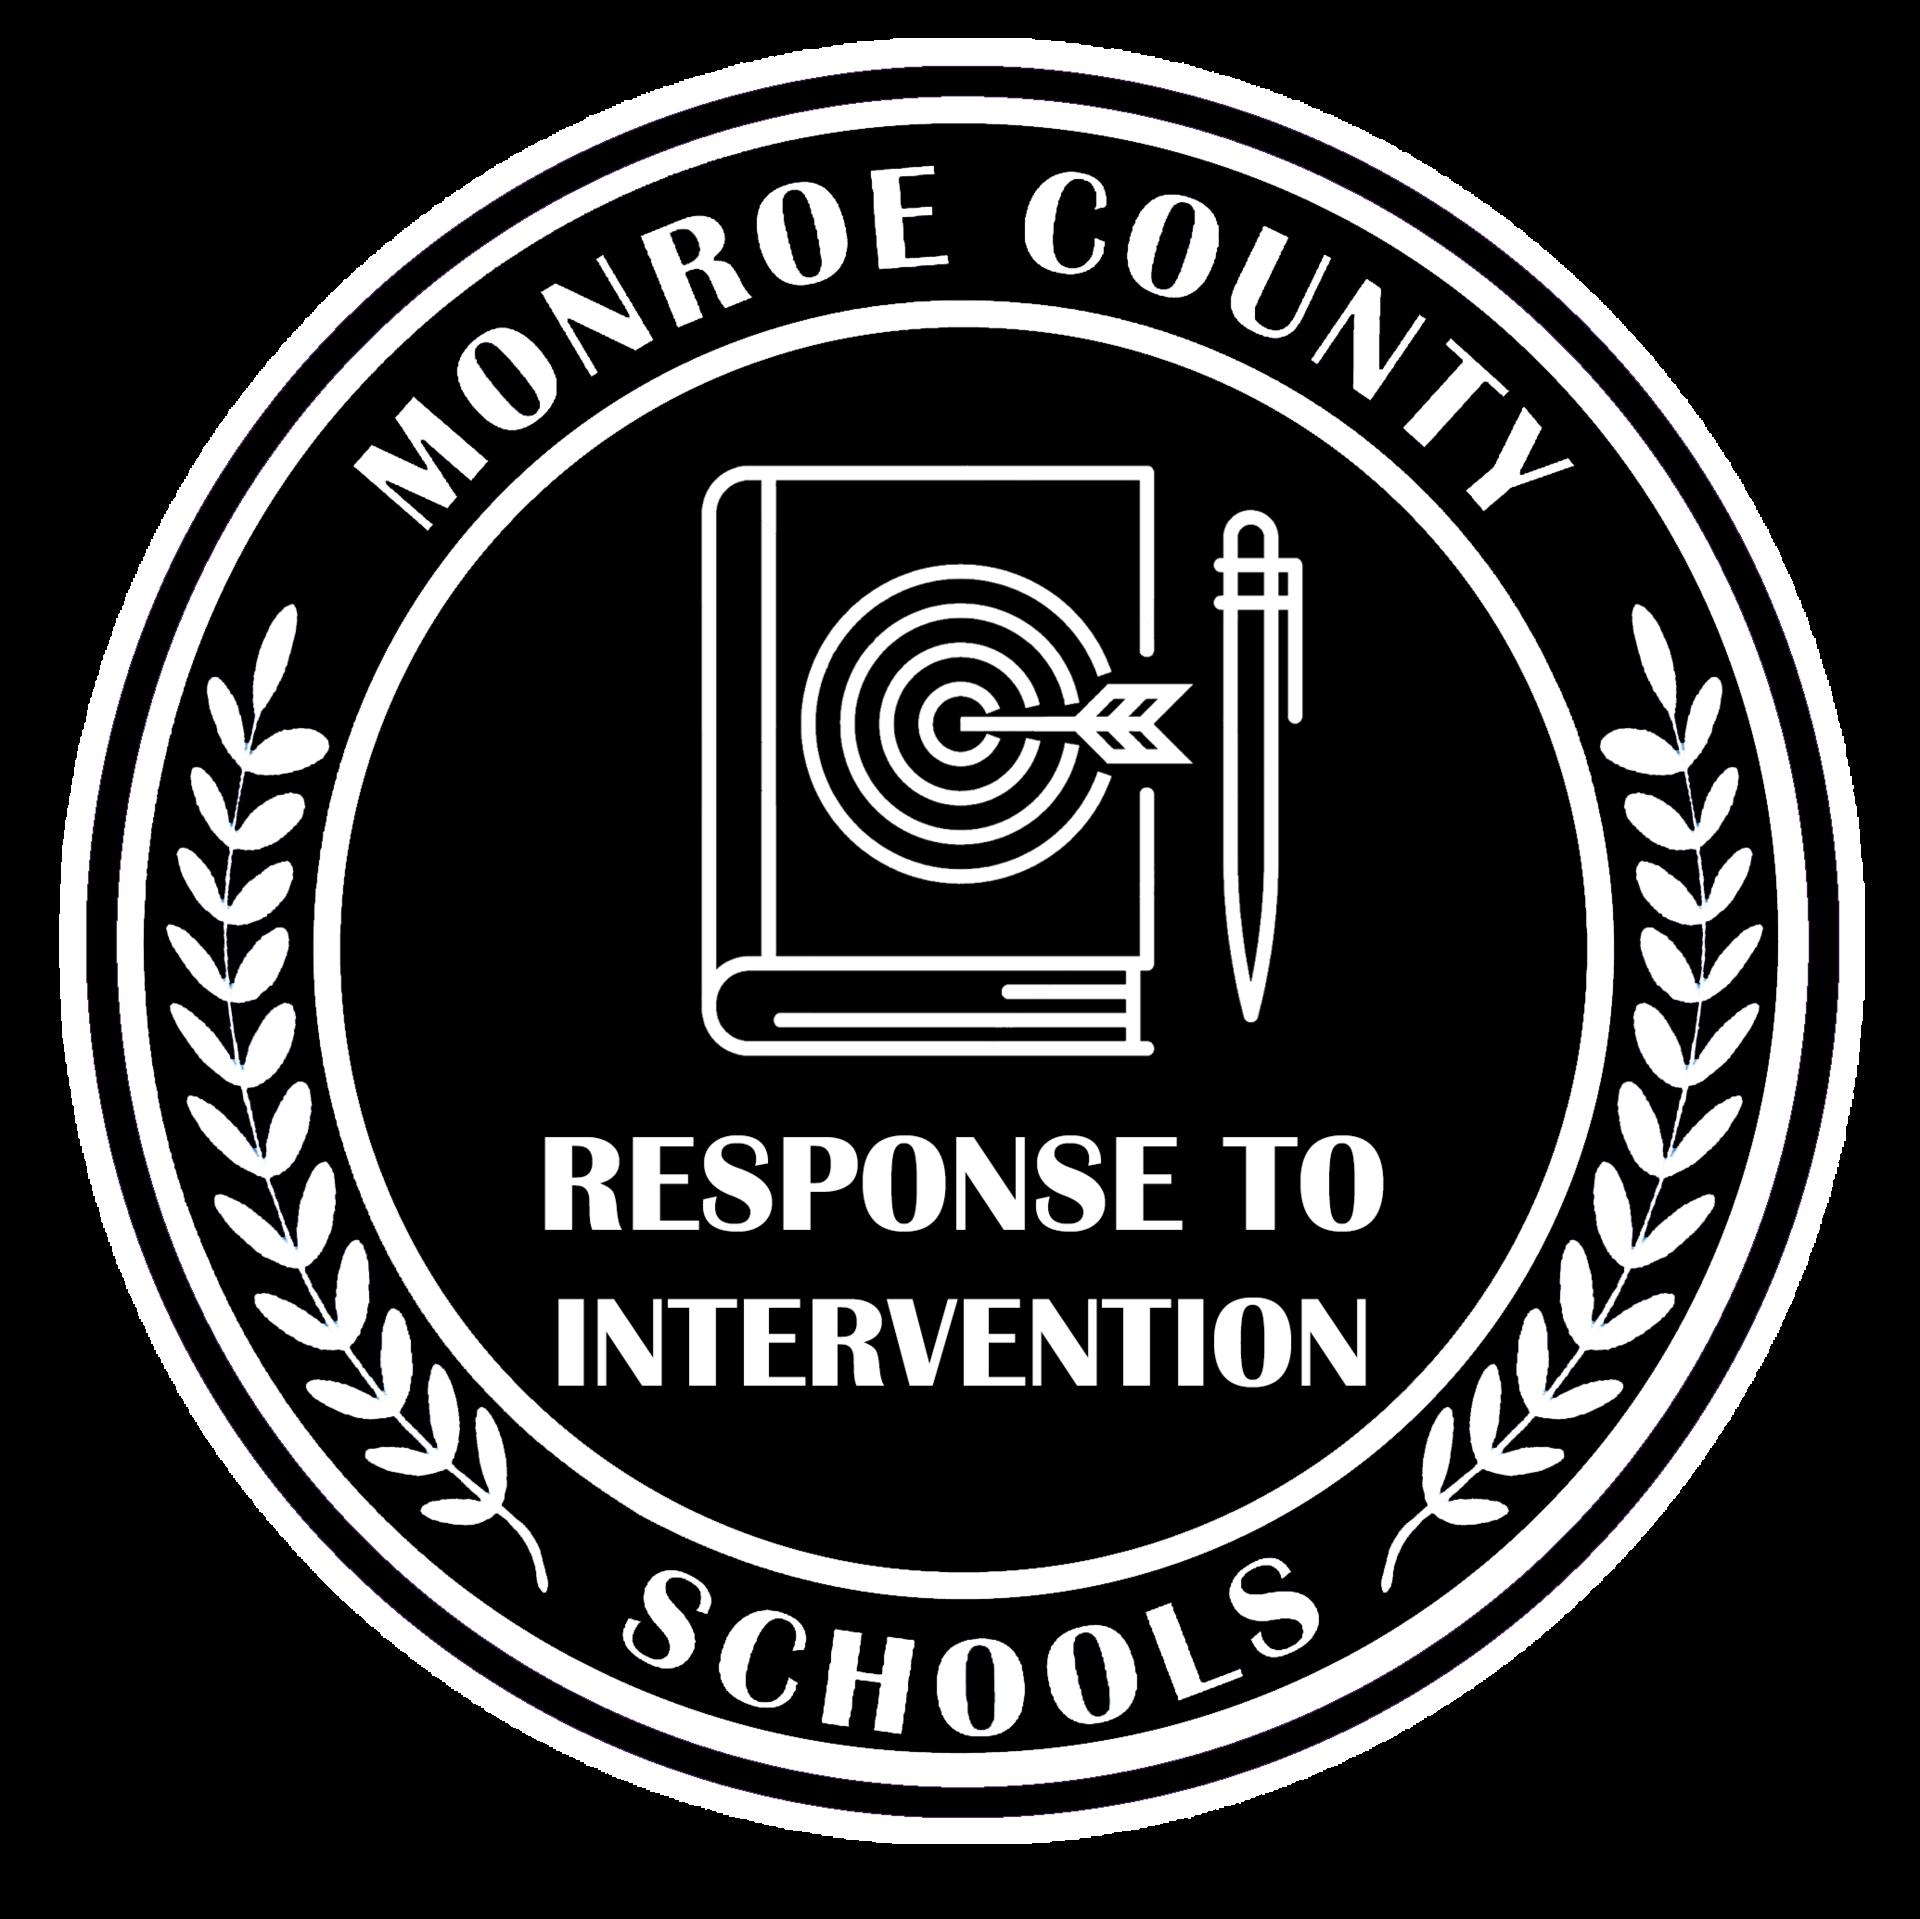 Monroe County School Response to Intervention Logo